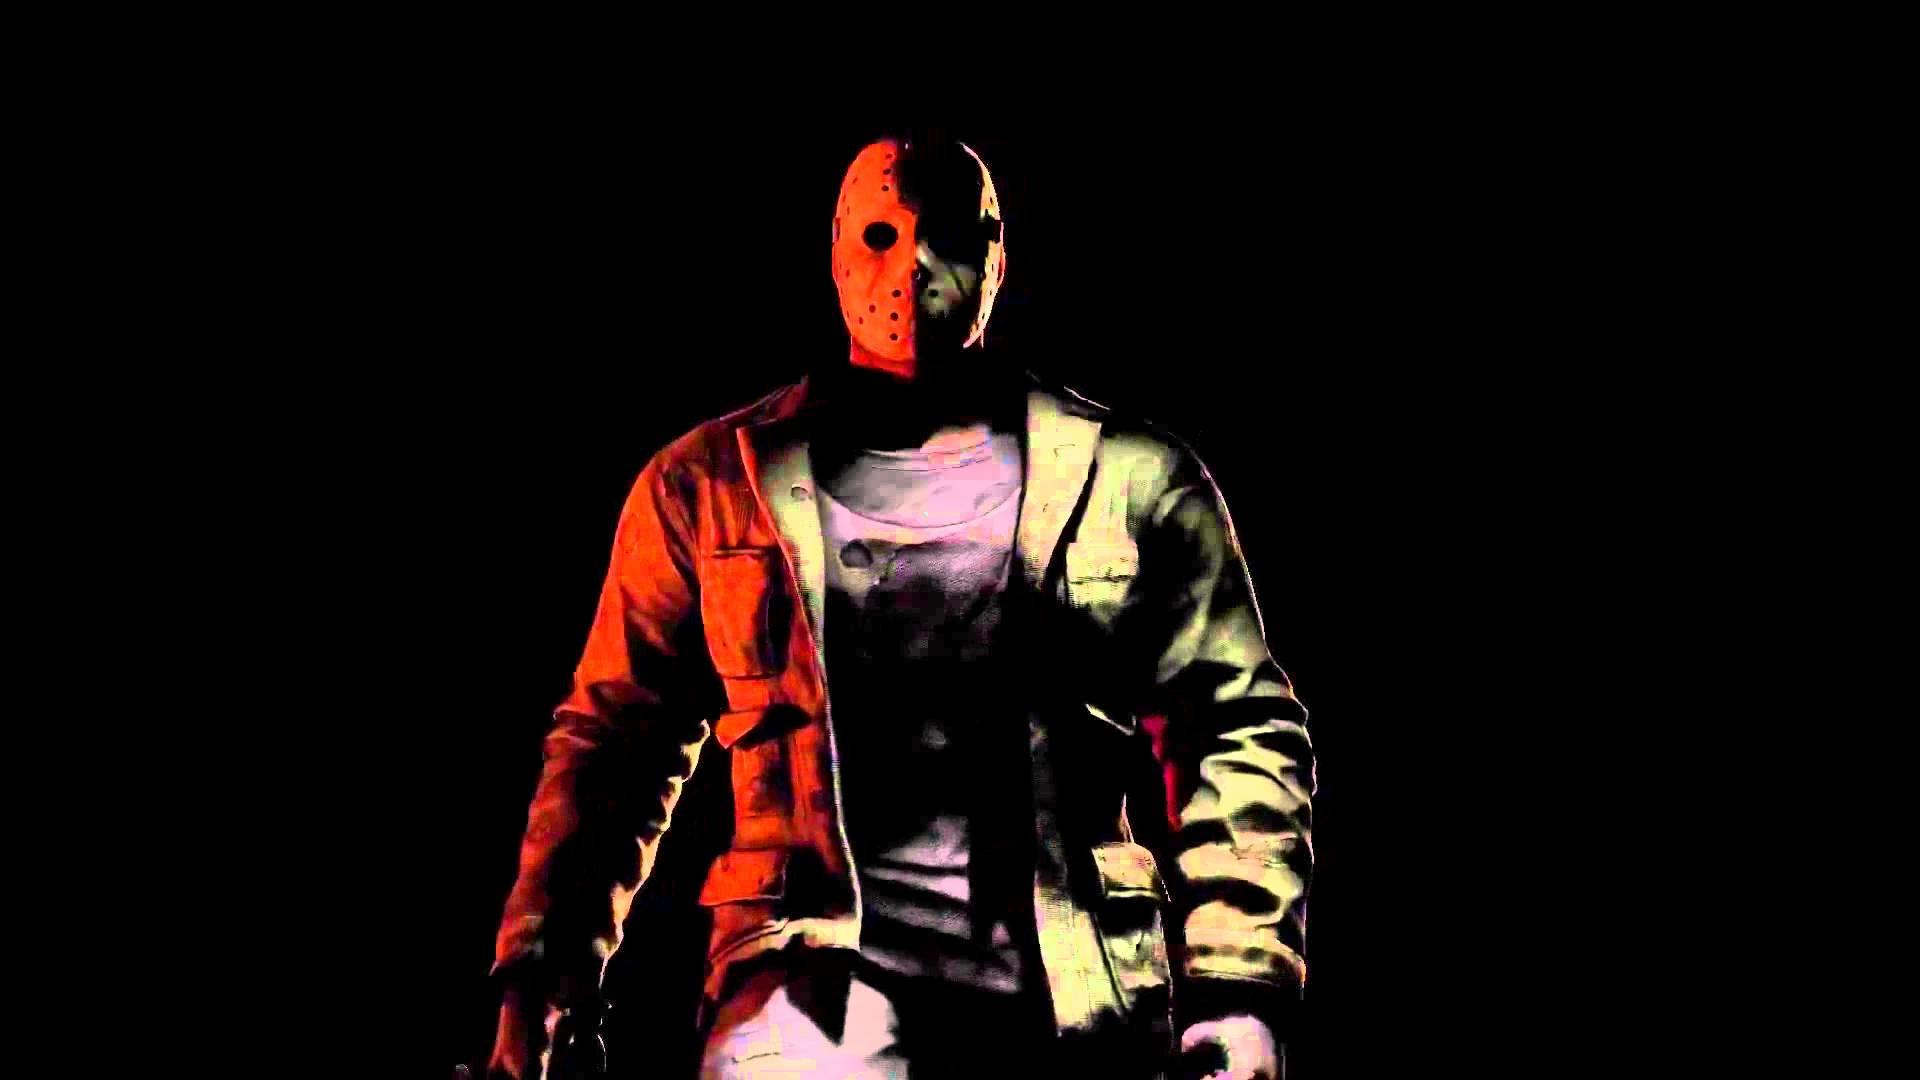 Mortal Kombat X – Jason Voorhees Friday 13th Reveal Trailer